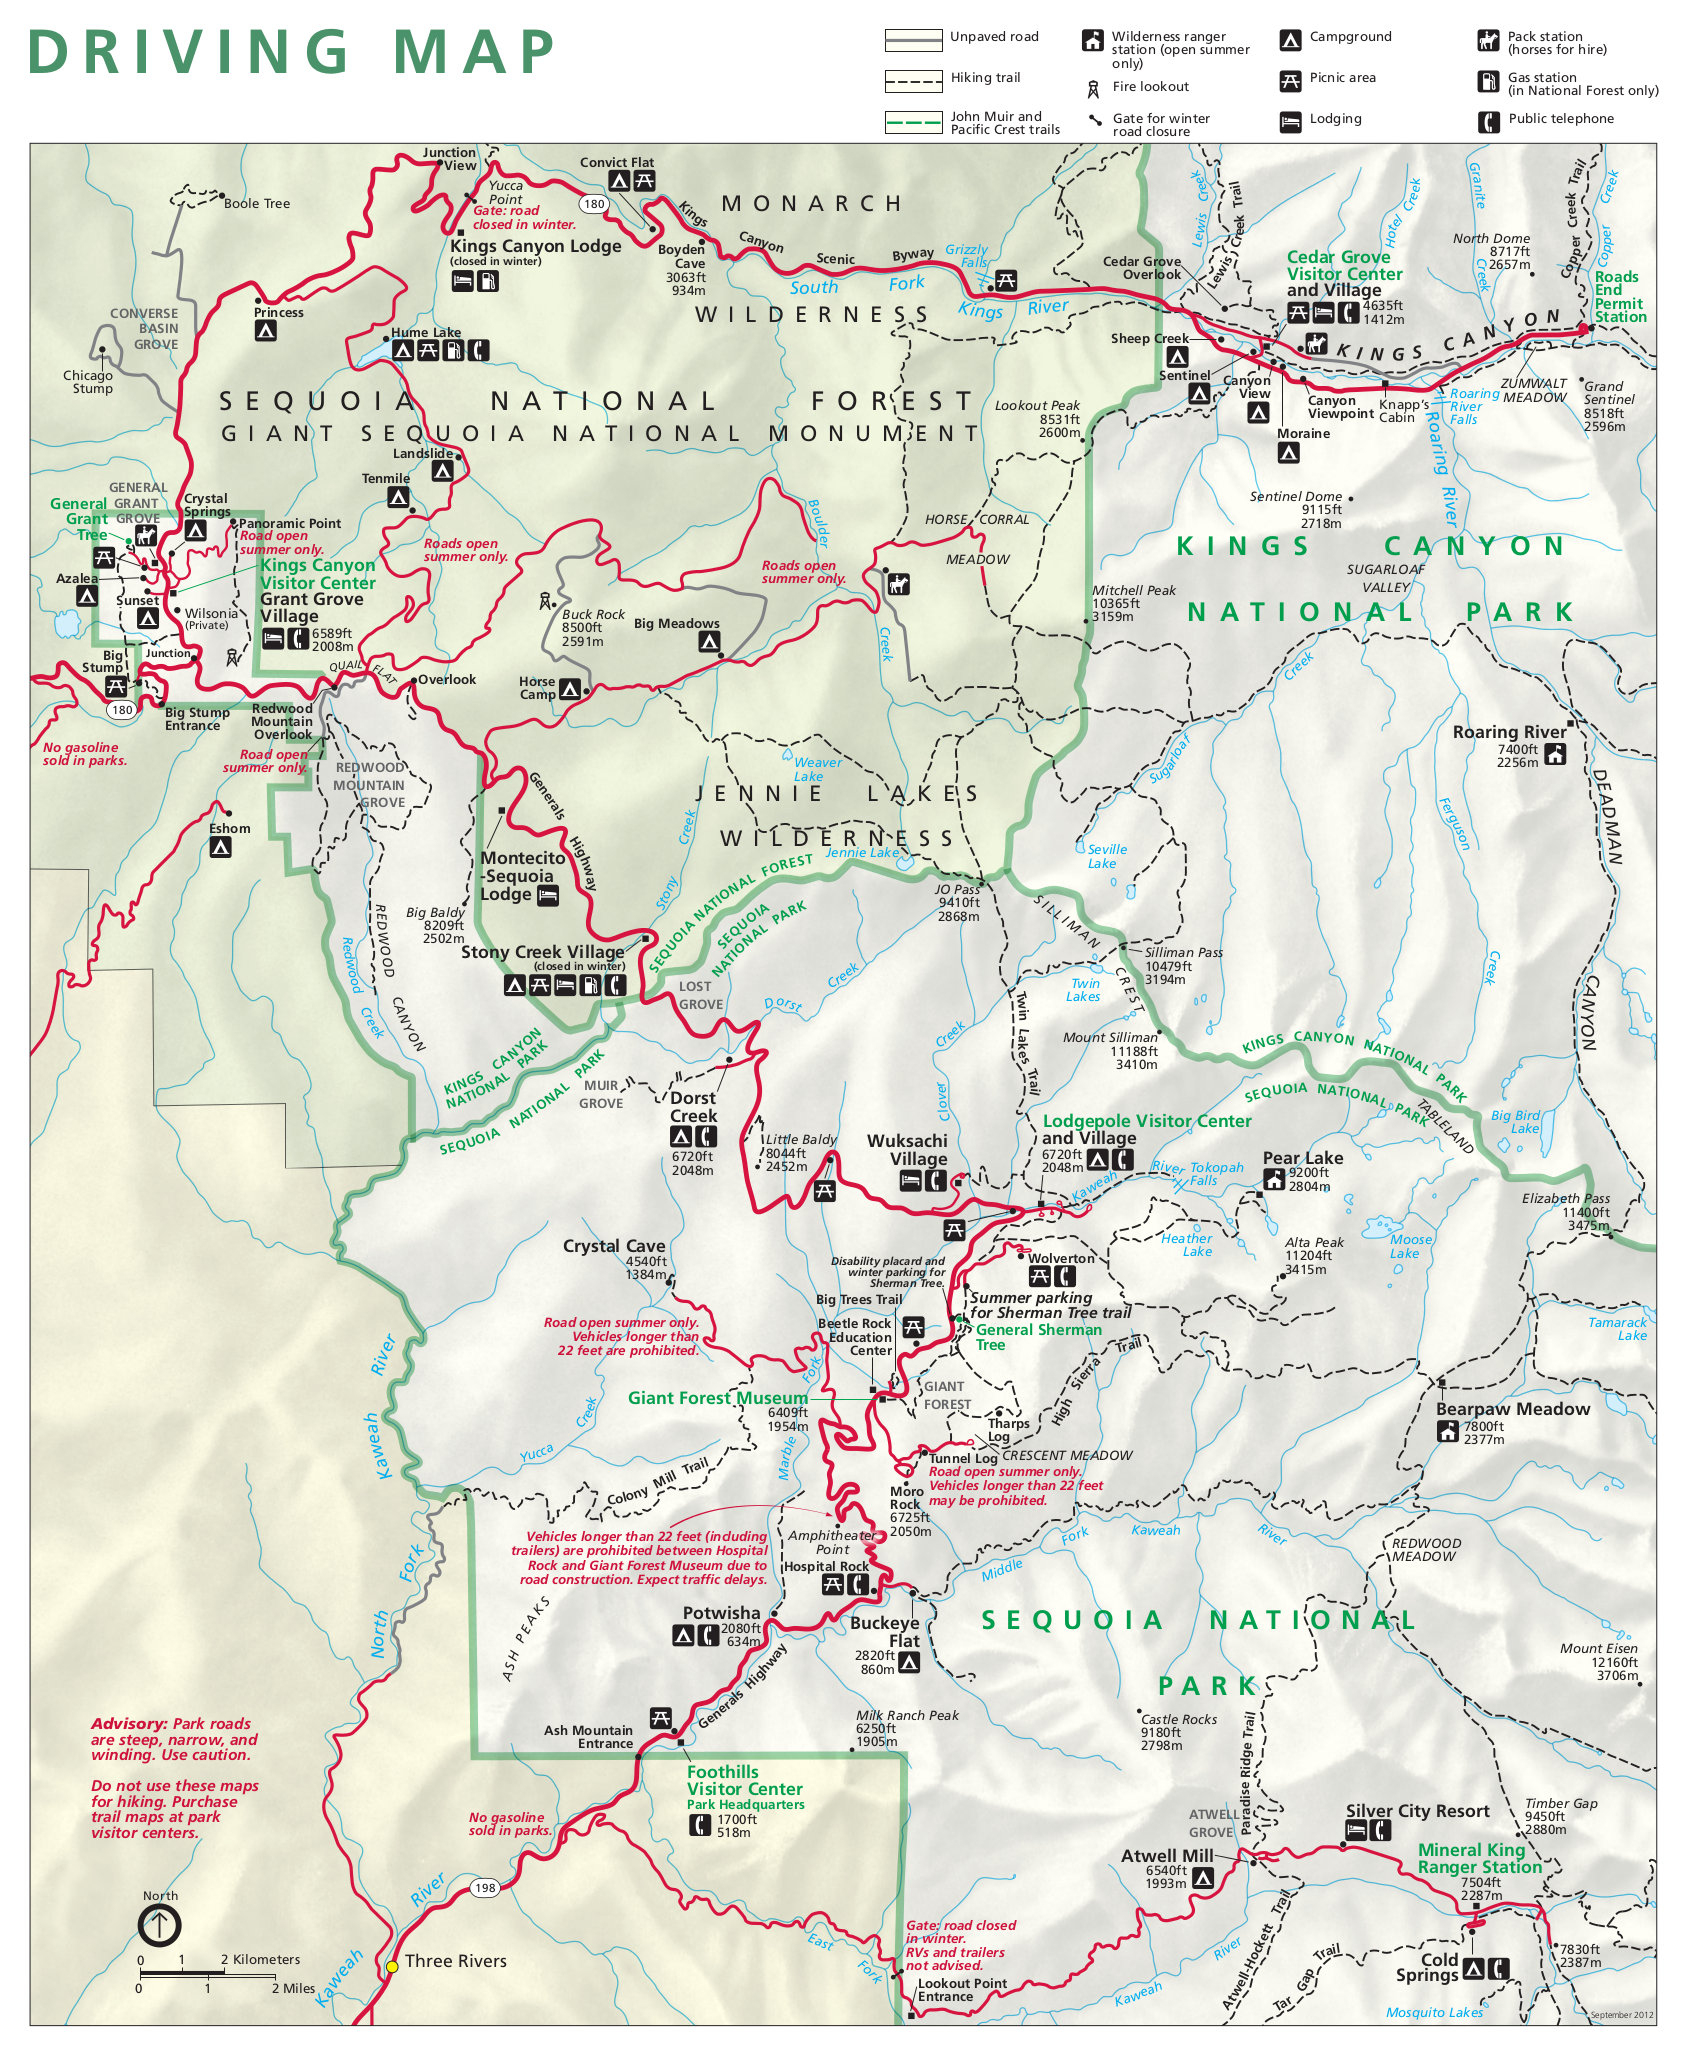 Sequoia Maps | Npmaps - Just Free Maps, Period. - Sequoia National Park California Map